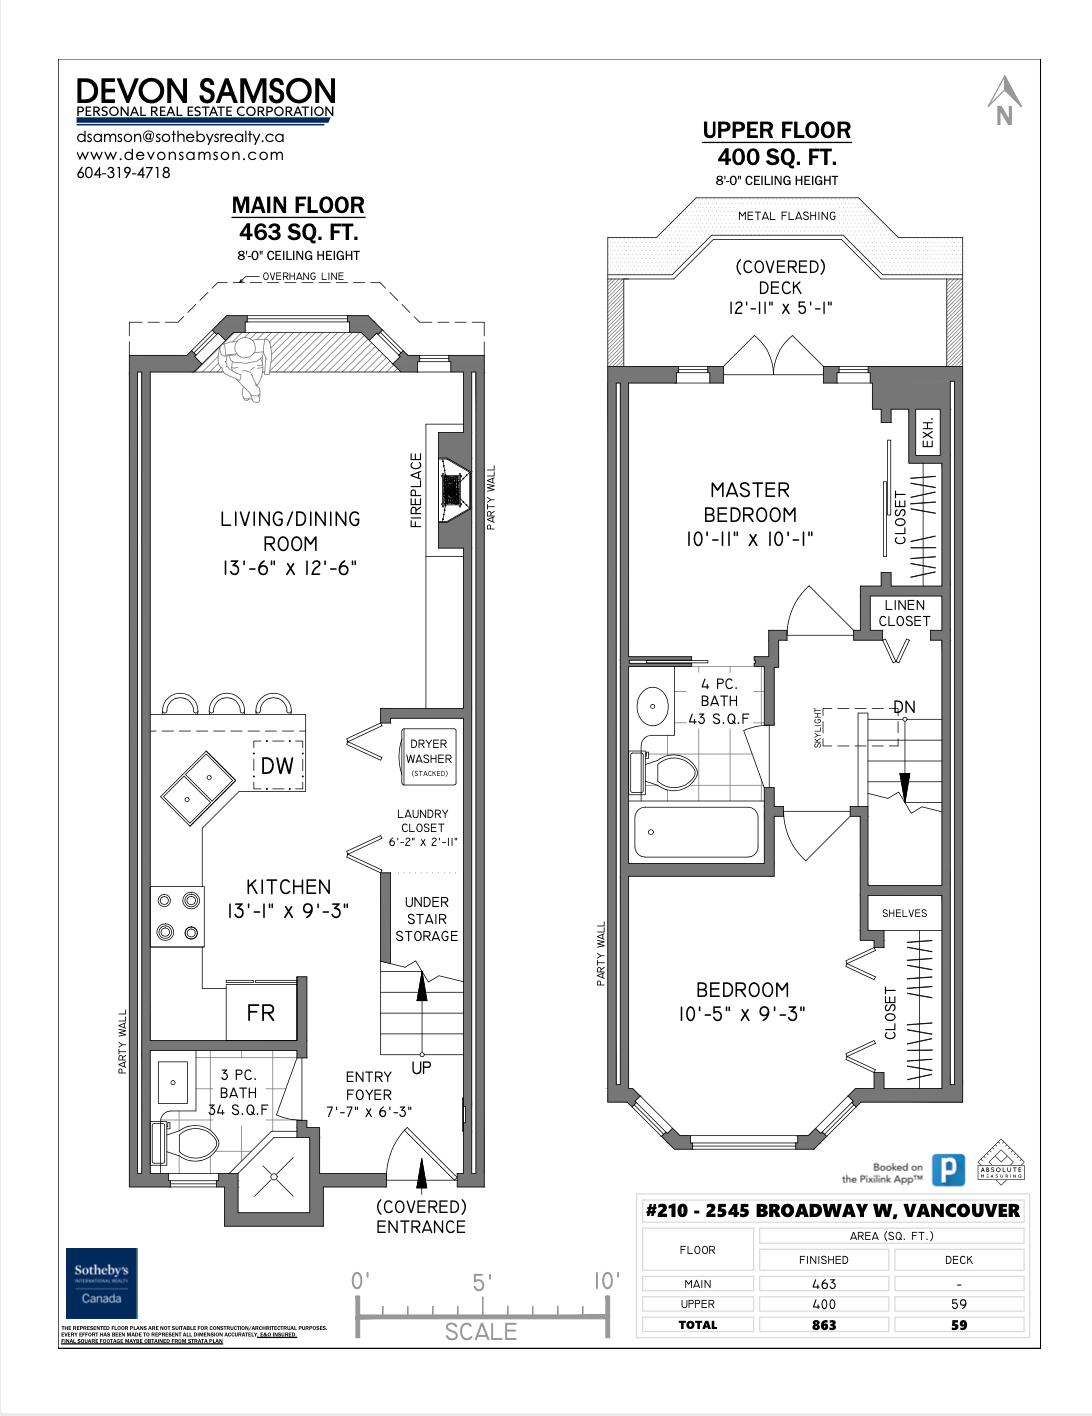 210 2545 W Broadway Vancouver, BC - Floor Plan